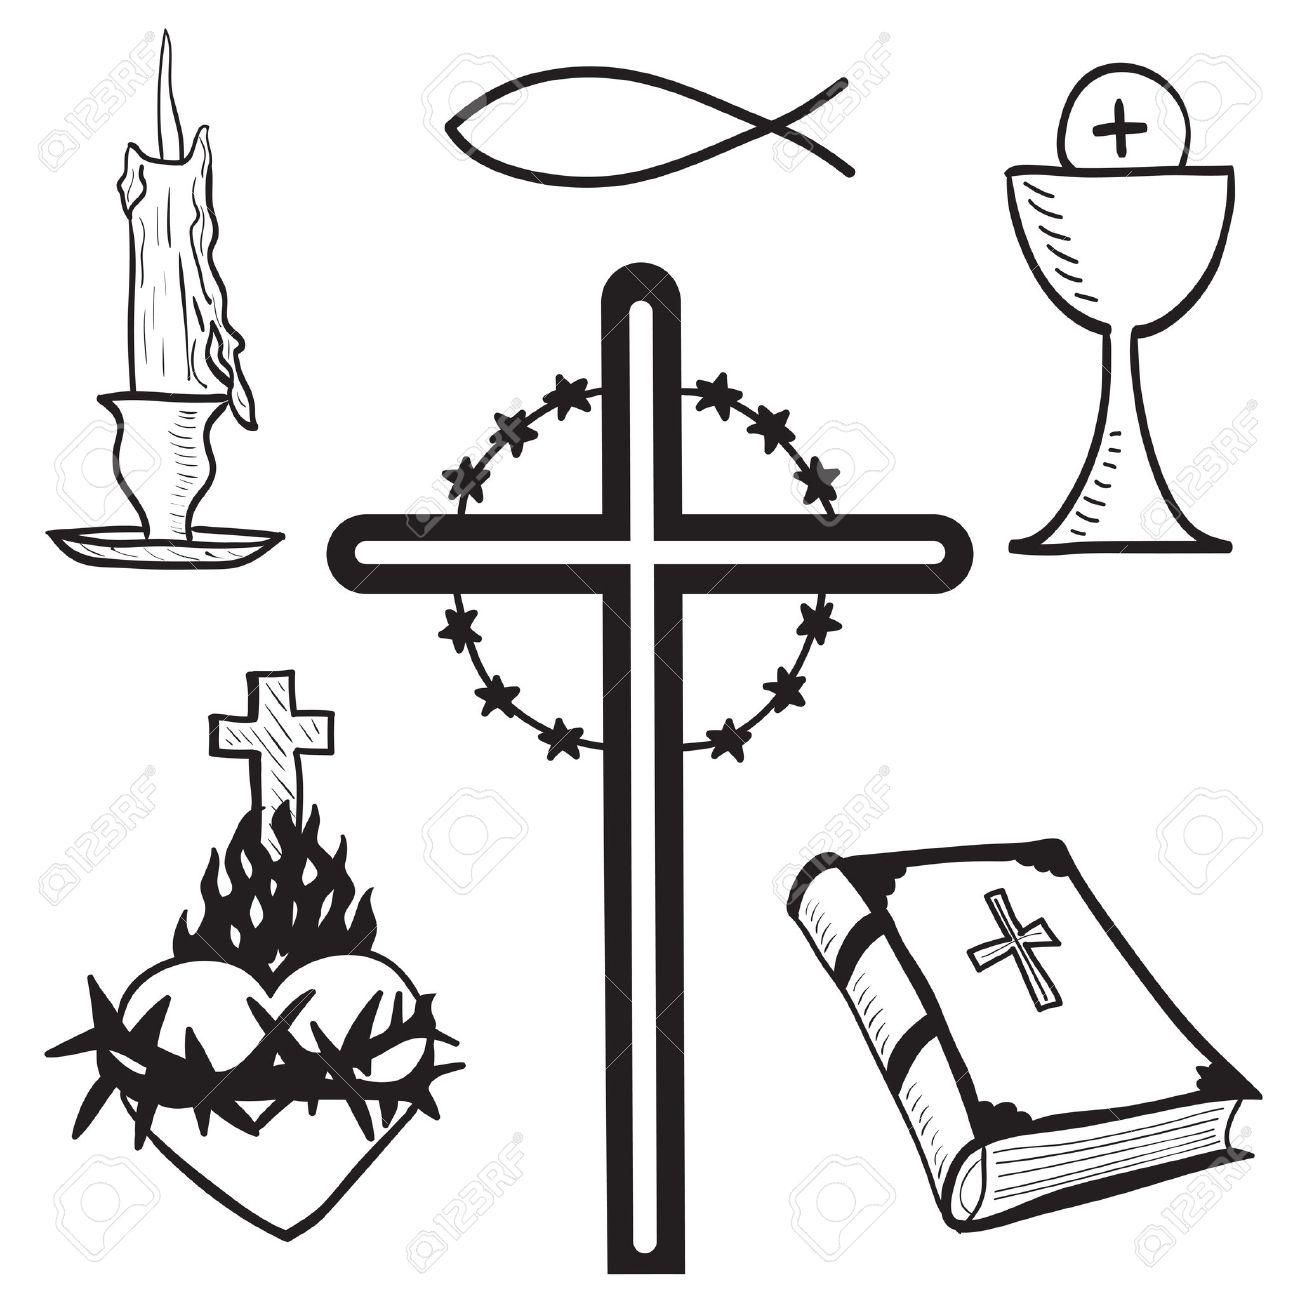 1300x1300 Christian Hand Drawn Symbols Illustration